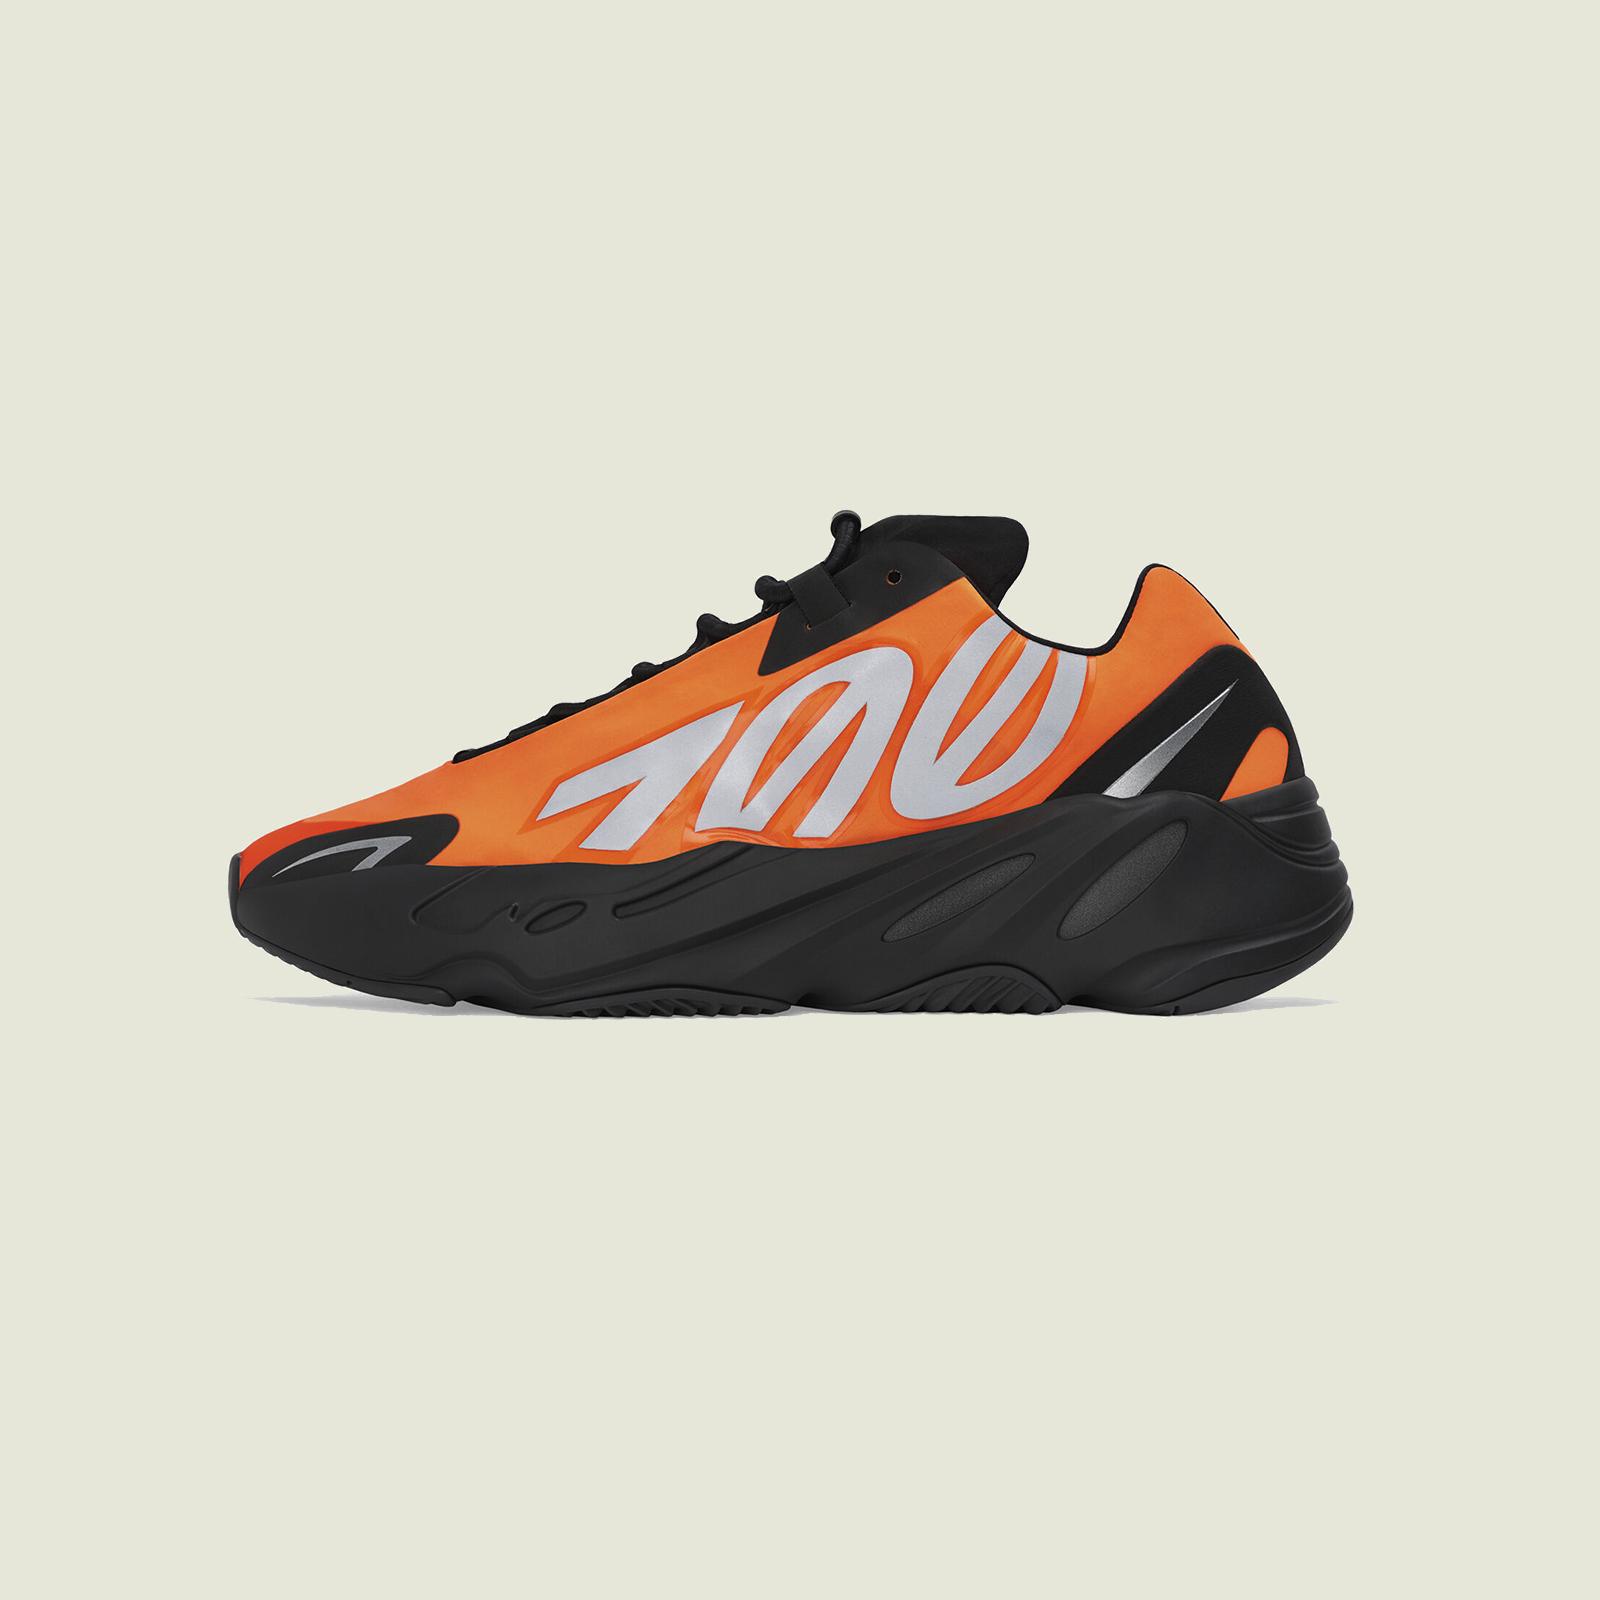 adidas Yeezy Boost 700 MNVN - Fv3258